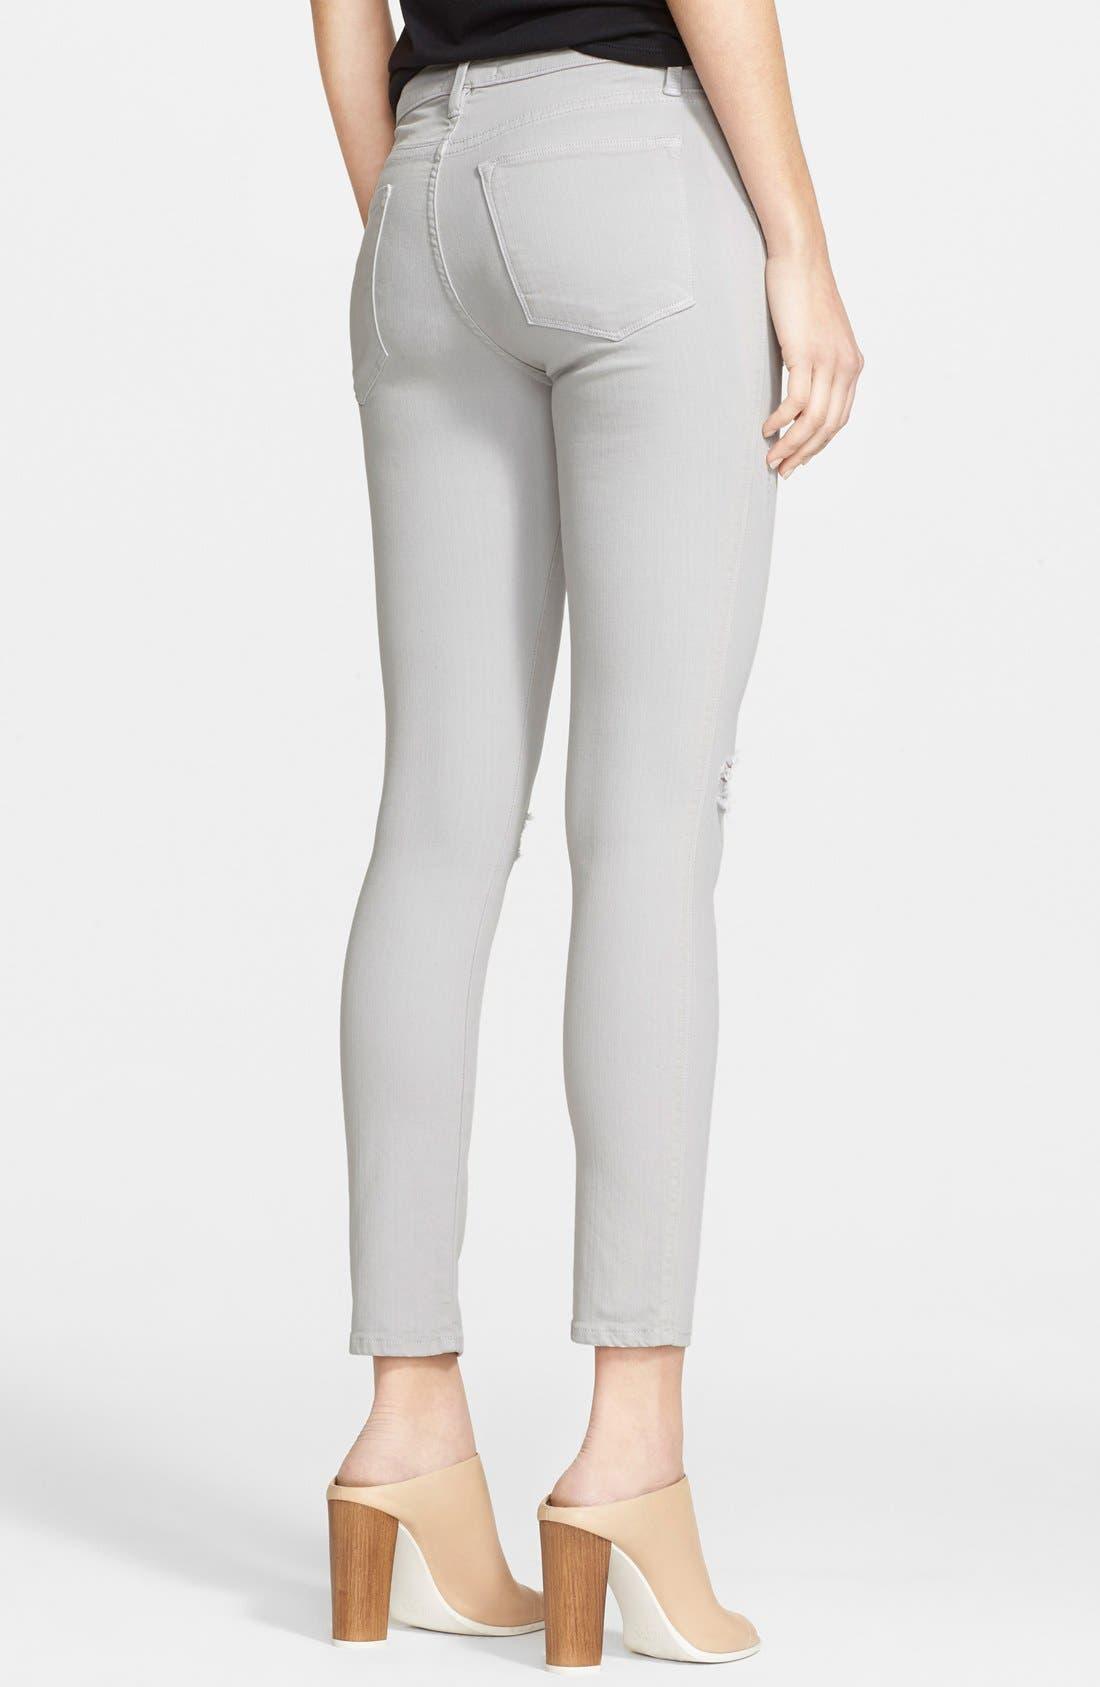 Alternate Image 2  - Frame Denim 'Le High Skinny Rip' Destroyed Jeans (Putty)